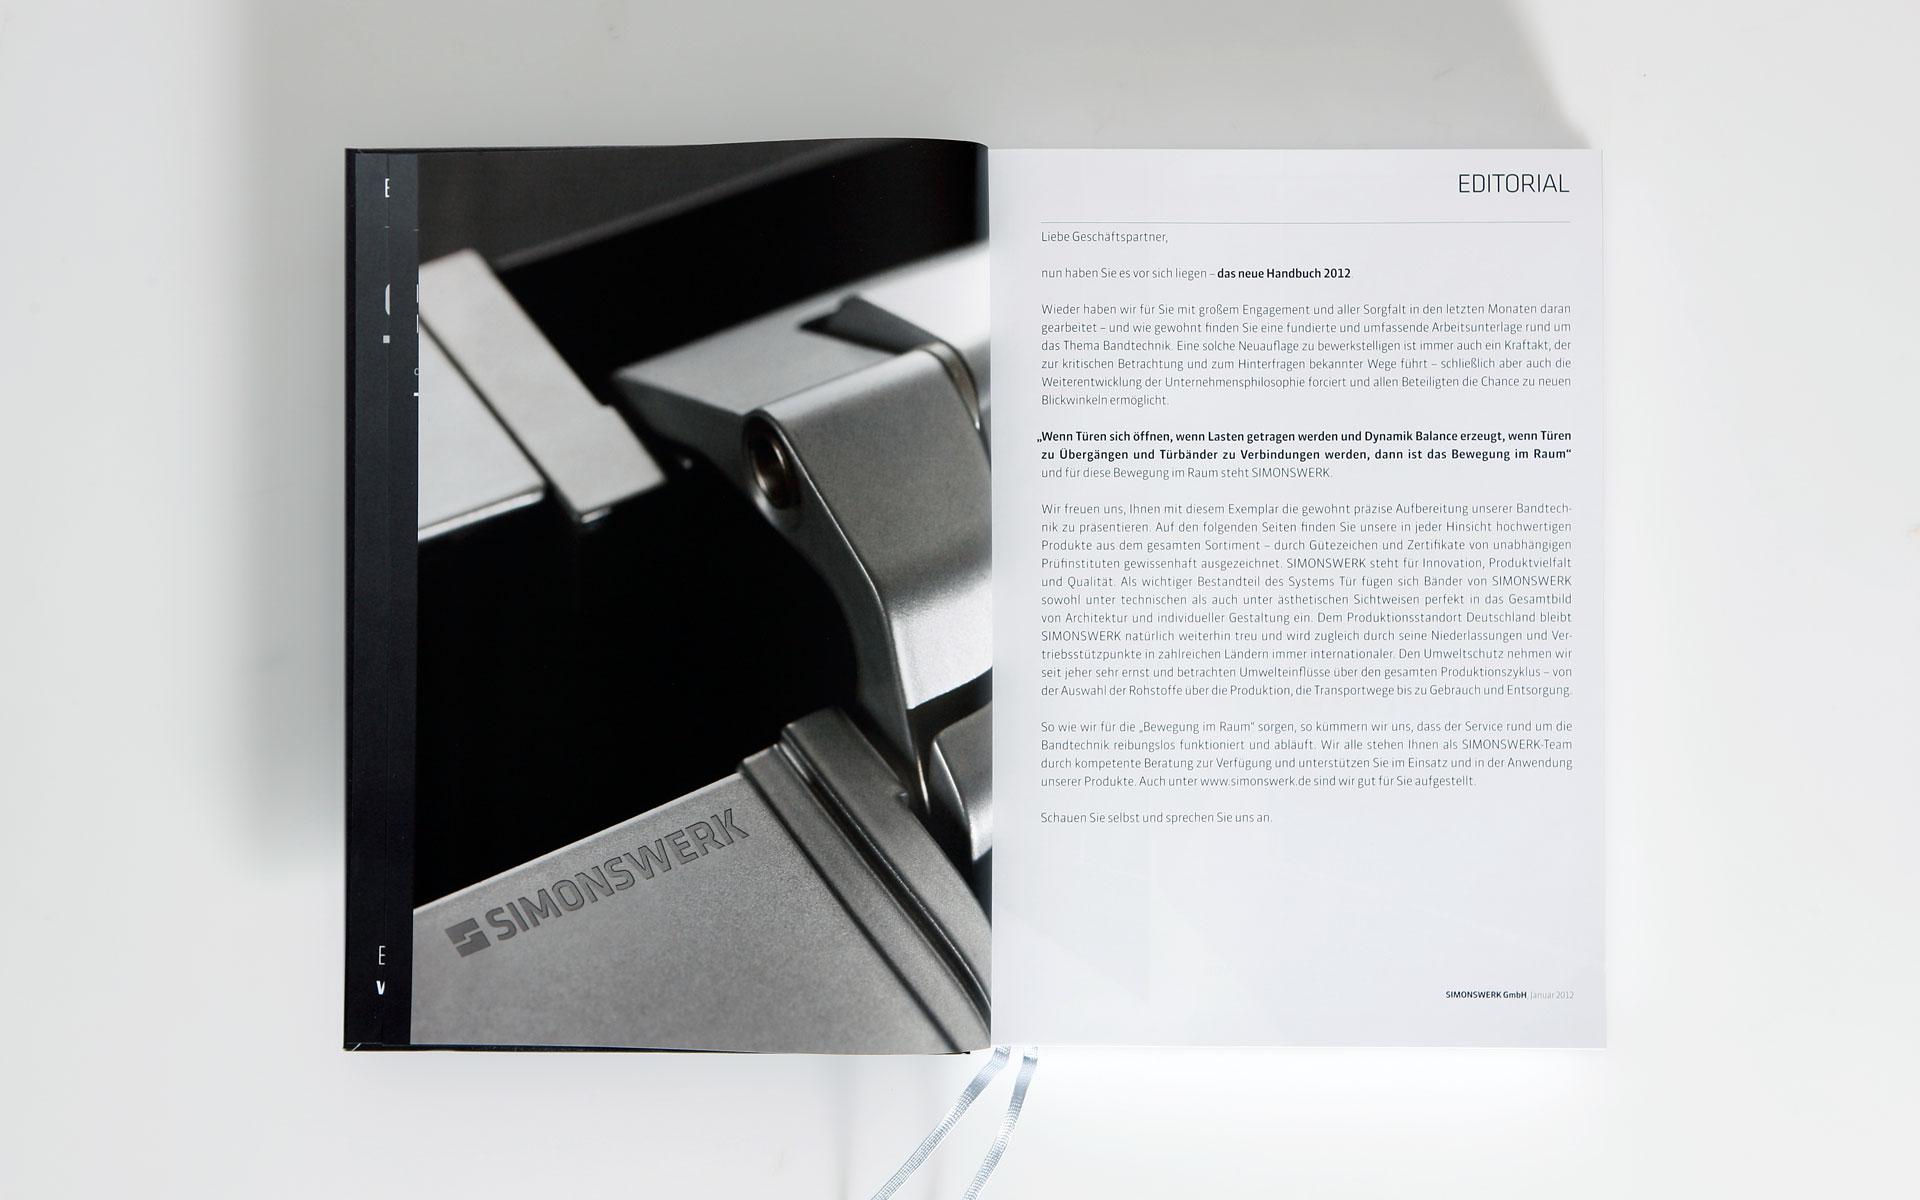 Simonswerk Kompendium 2012, Handbuch, Doppelseite, Editorial